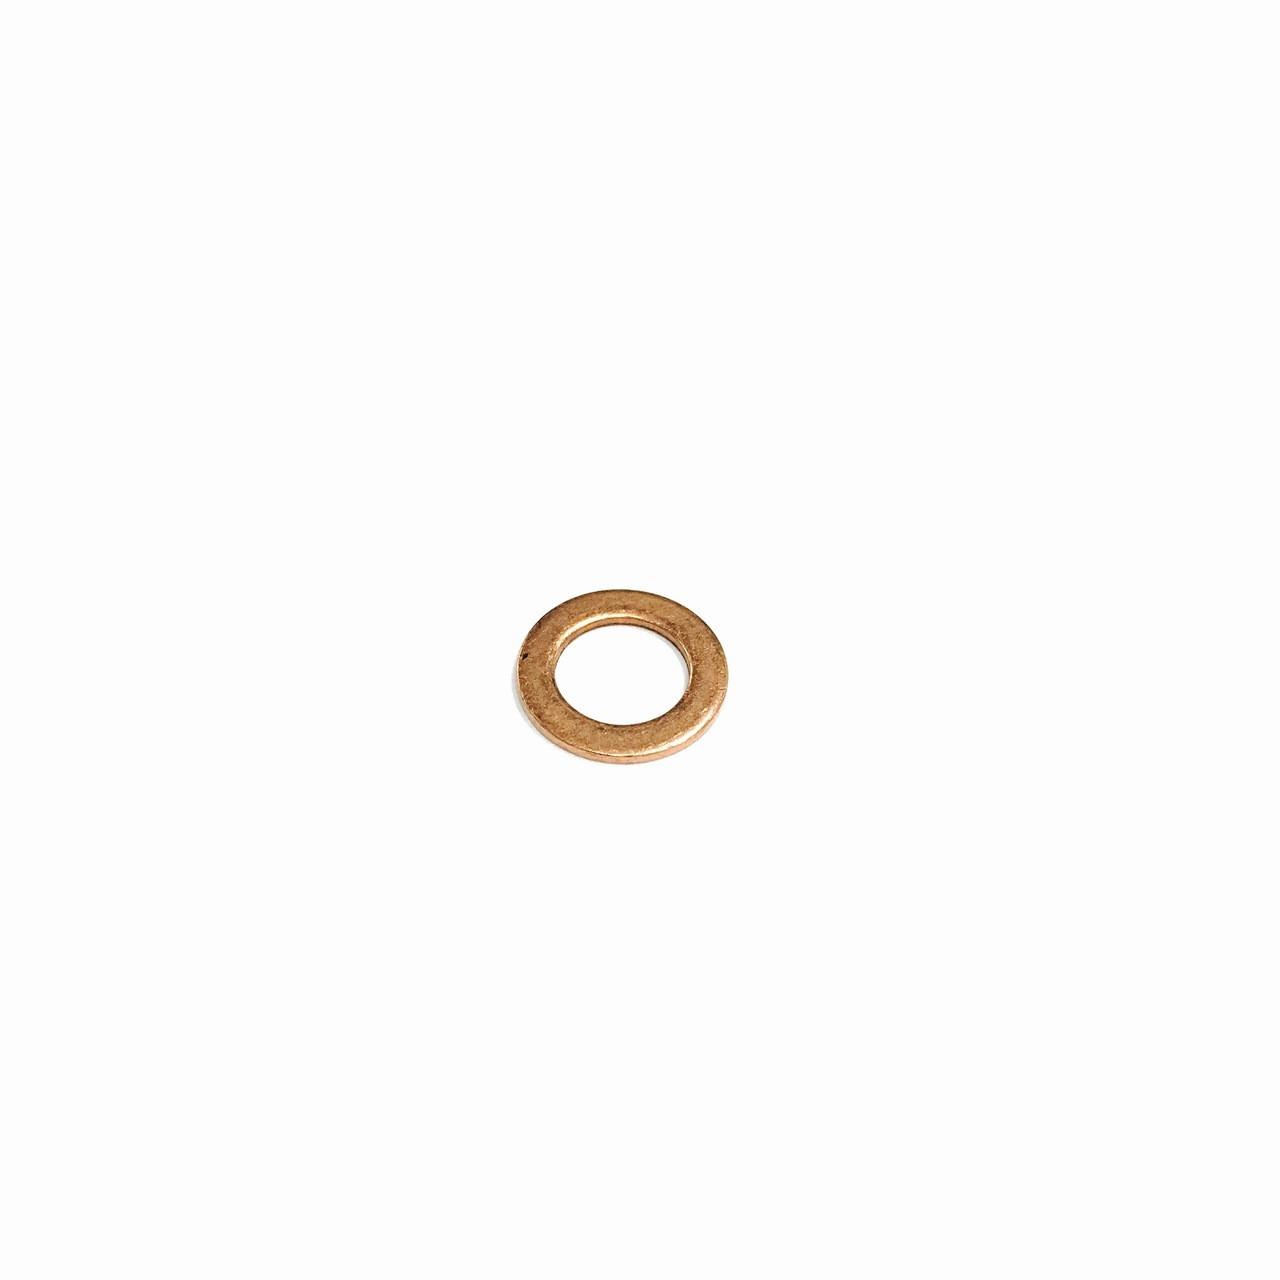 Copper Drain Plug Washer Set KTM 50 150 250 450 350 DPWKTM Bolt MC Hardware